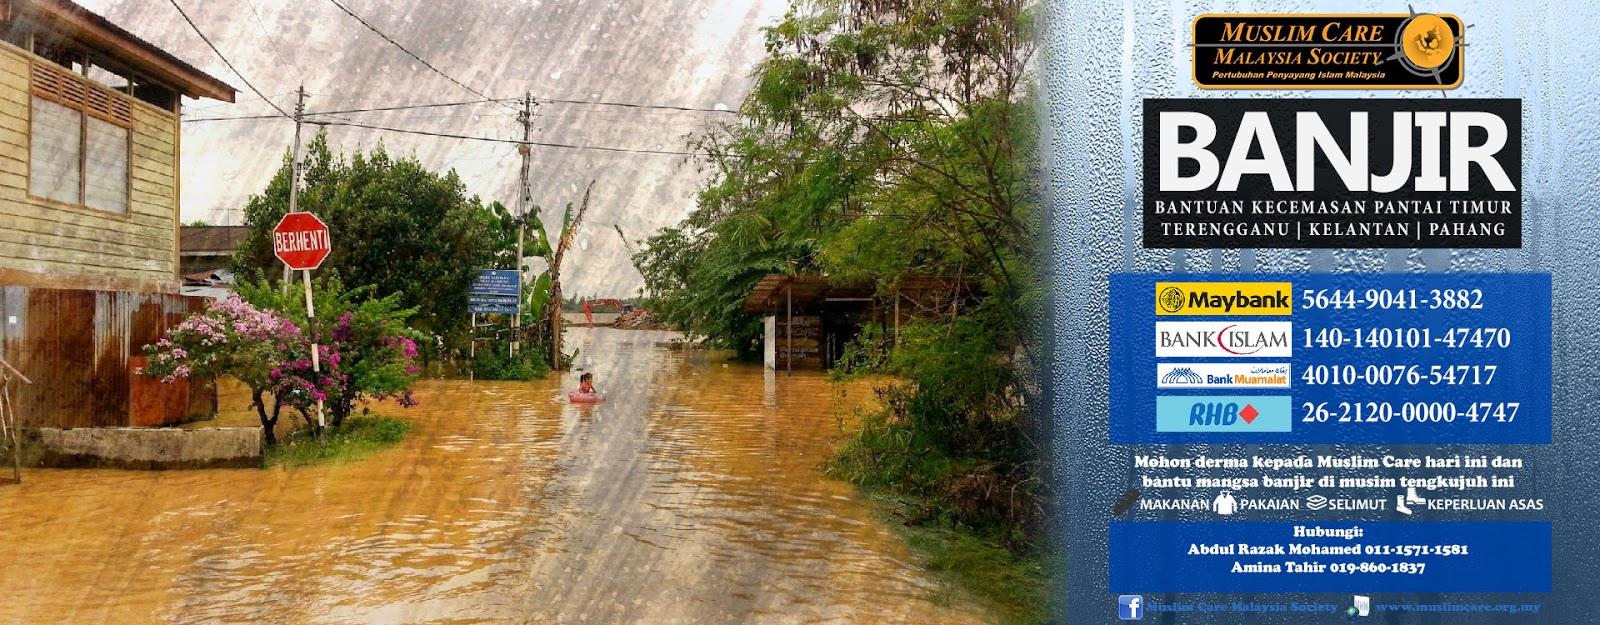 muslim care, bantuan banjir, pantai timur, gelombang pantai timur